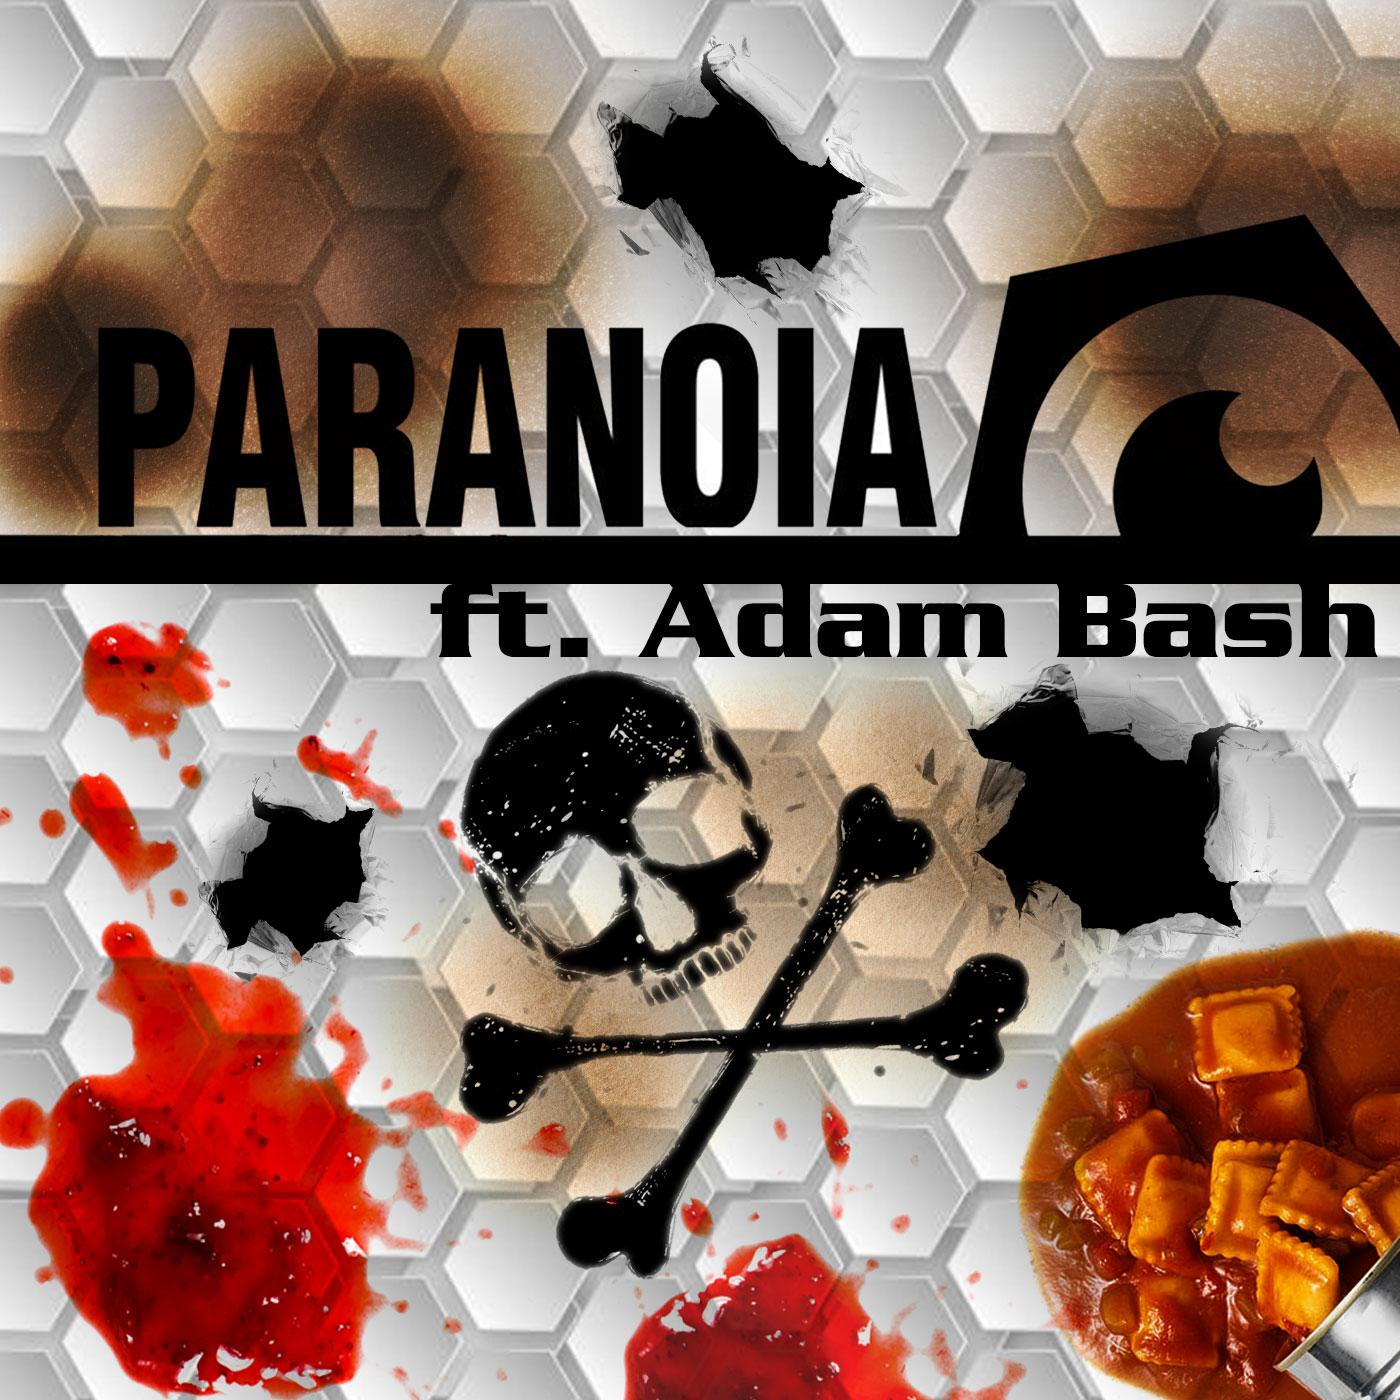 Paranoia-Titlecard-Week4-NoLogo.jpg